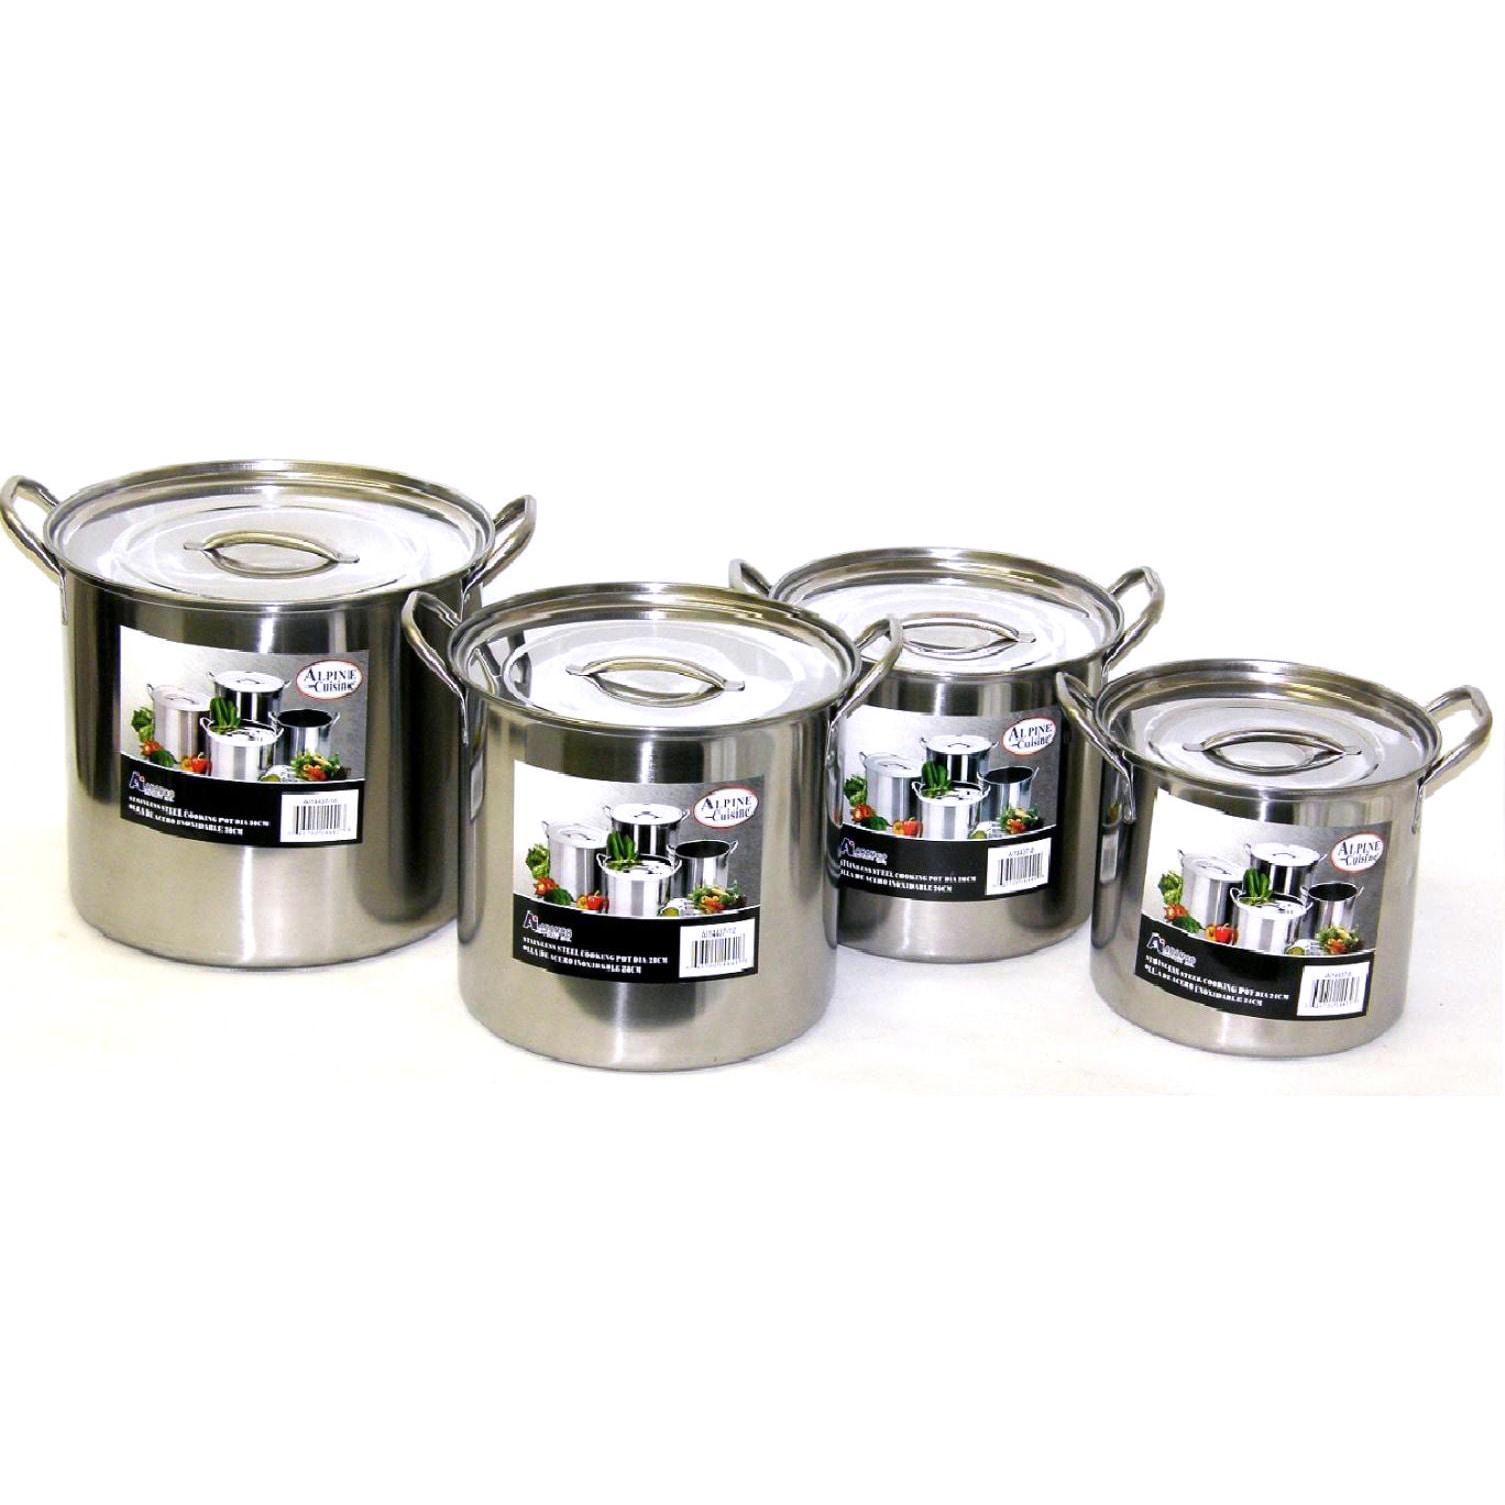 AmeriHome AmeriHome 6 Piece Stainless Steel Stock Pot Set